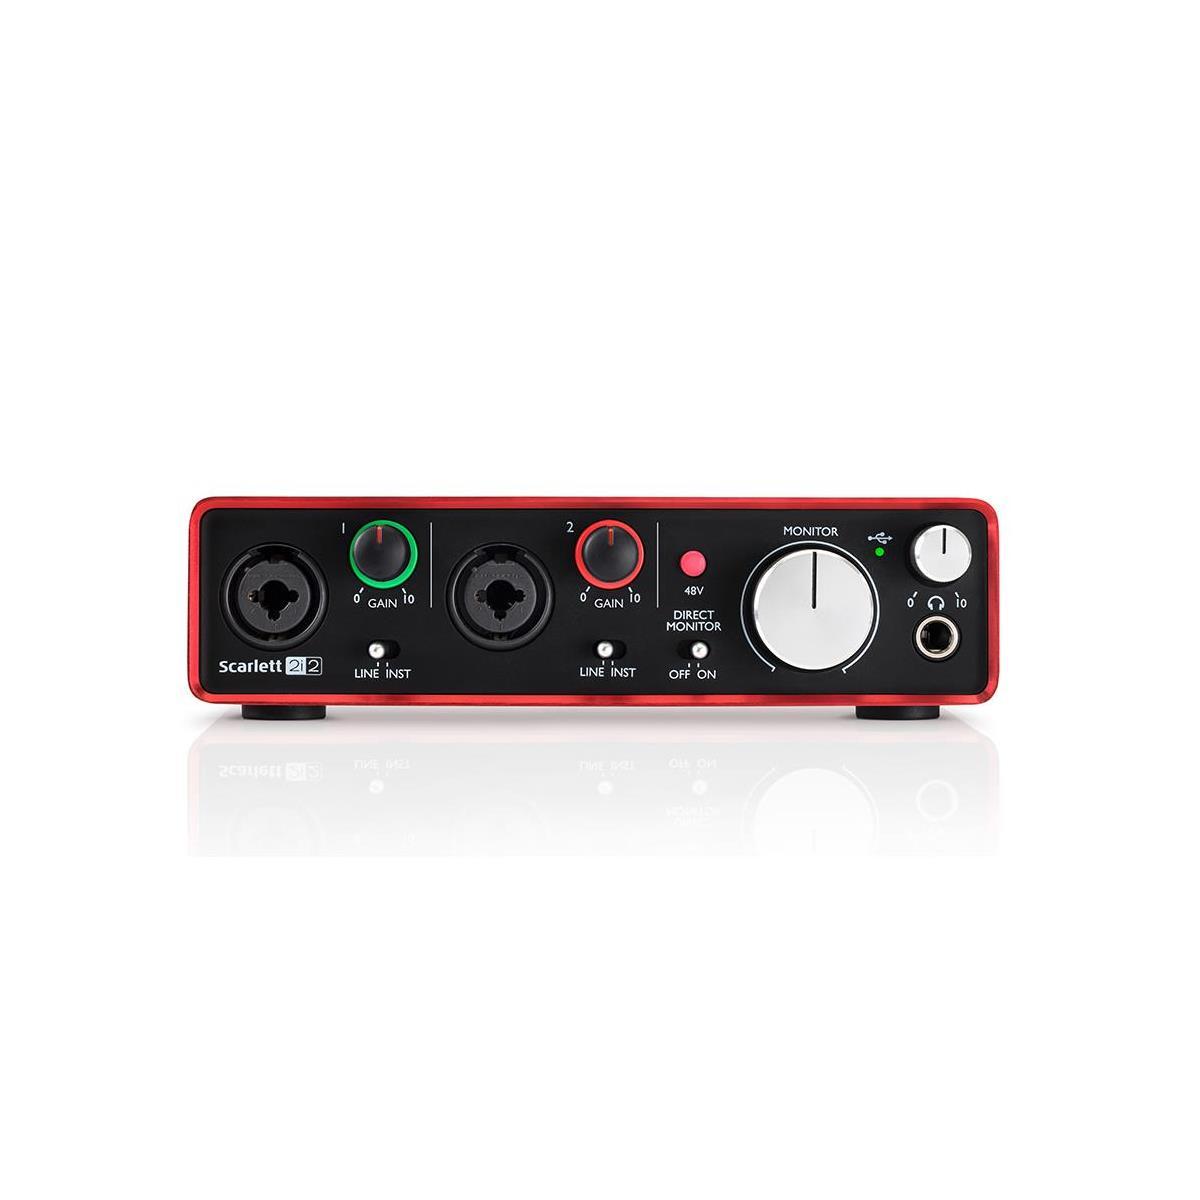 Focusrite Scarlett 2i2 2nd Gen Audio Interface $105 + free s/h